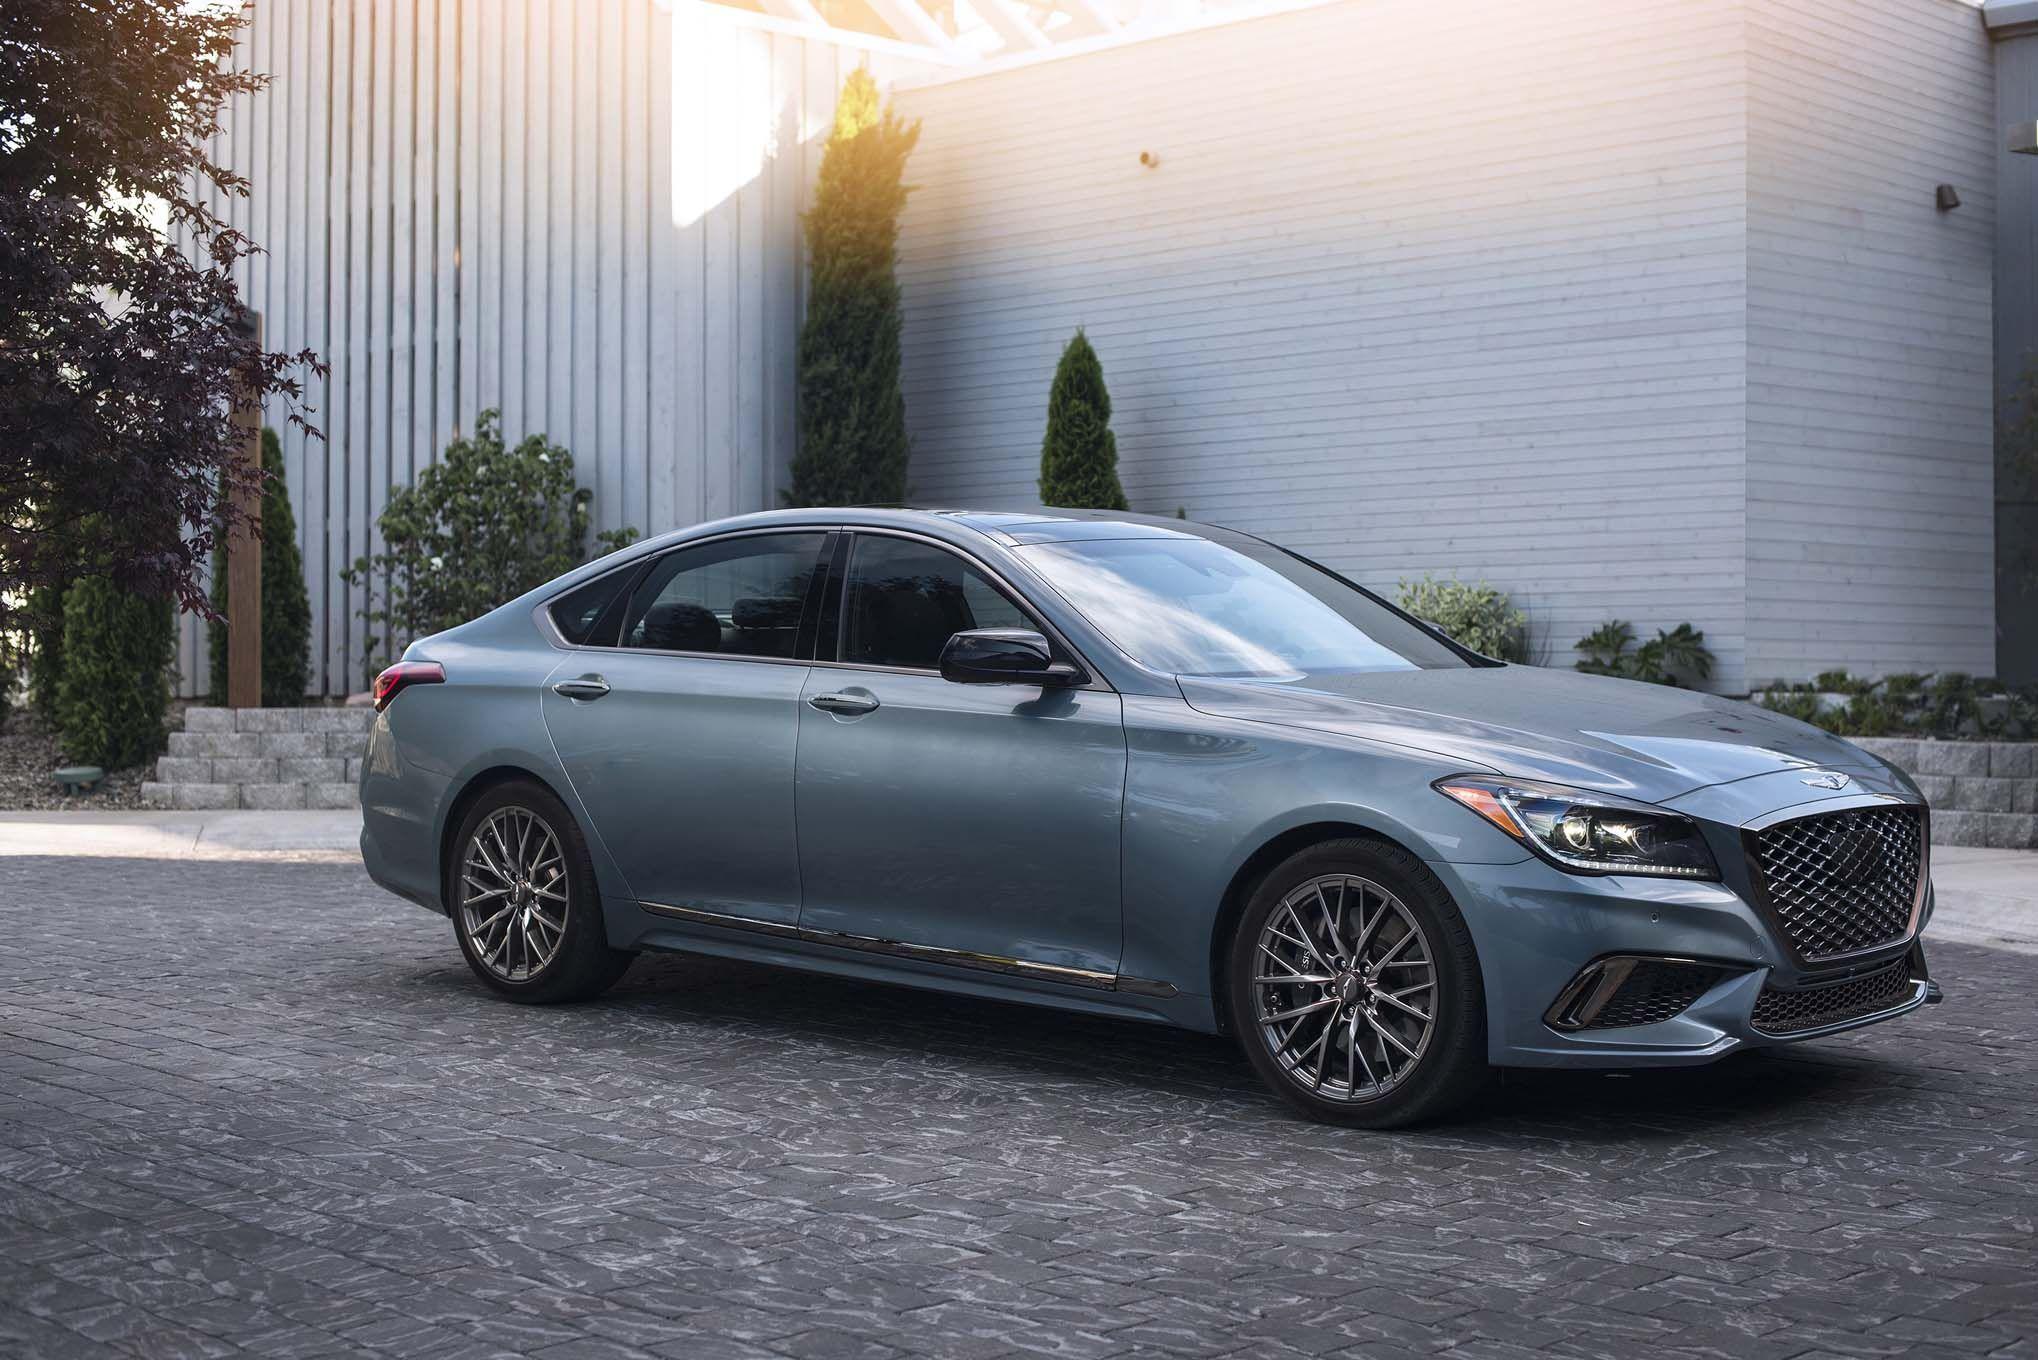 Genesis G80 Sport New Luxury Cars Hyundai Genesis Luxury Cars